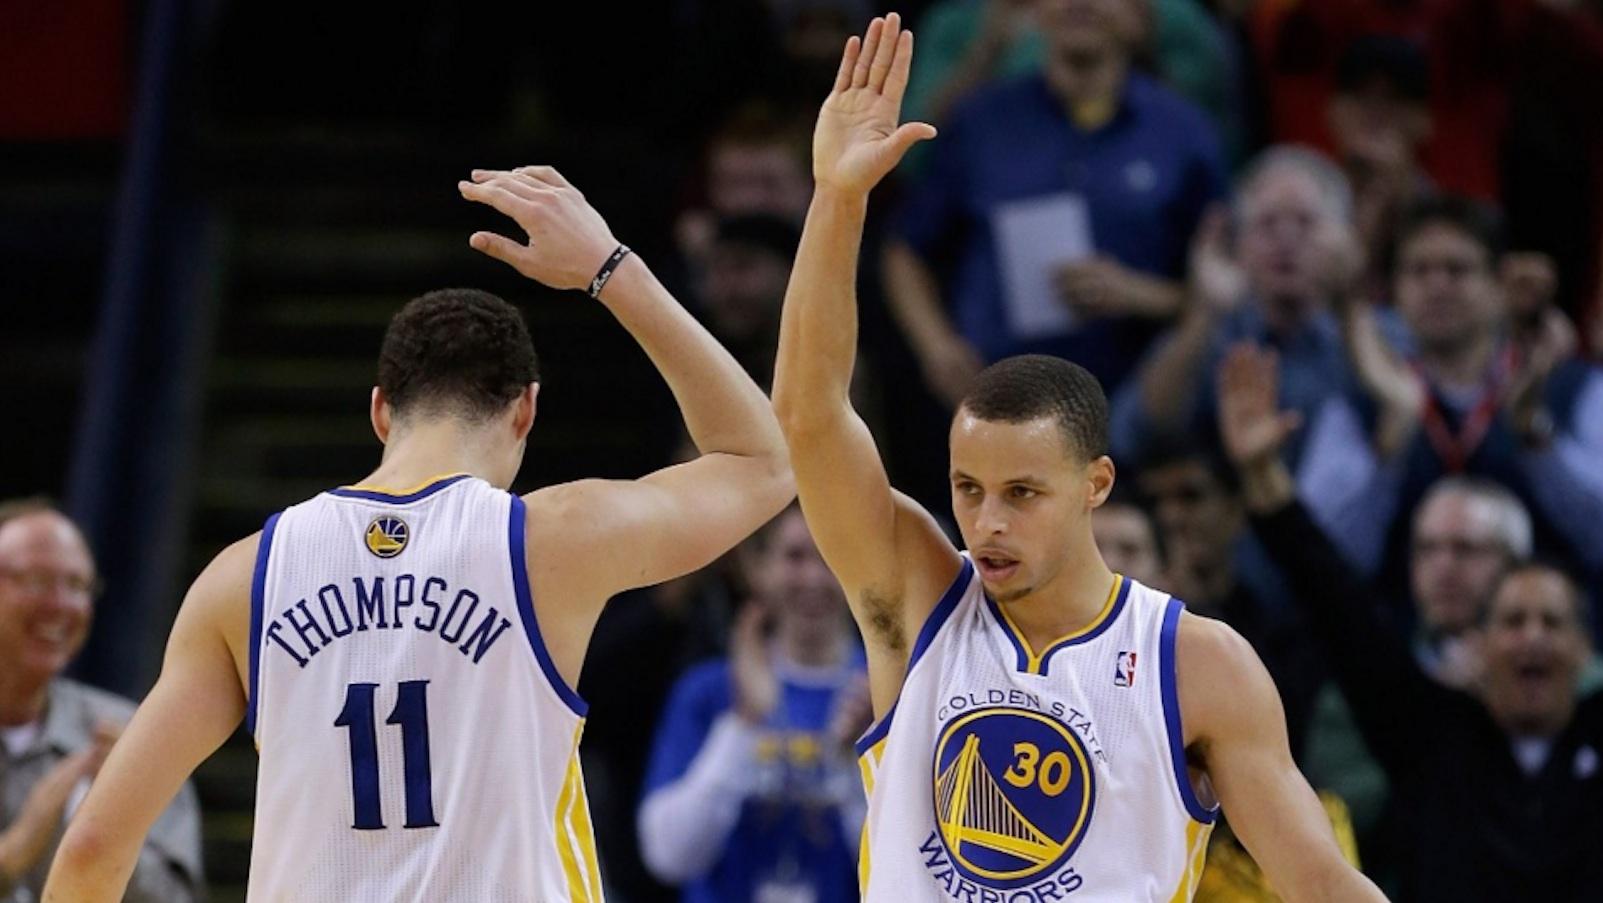 NBA: Golden State pareggia il conto vincendo Gara 2 a Toronto